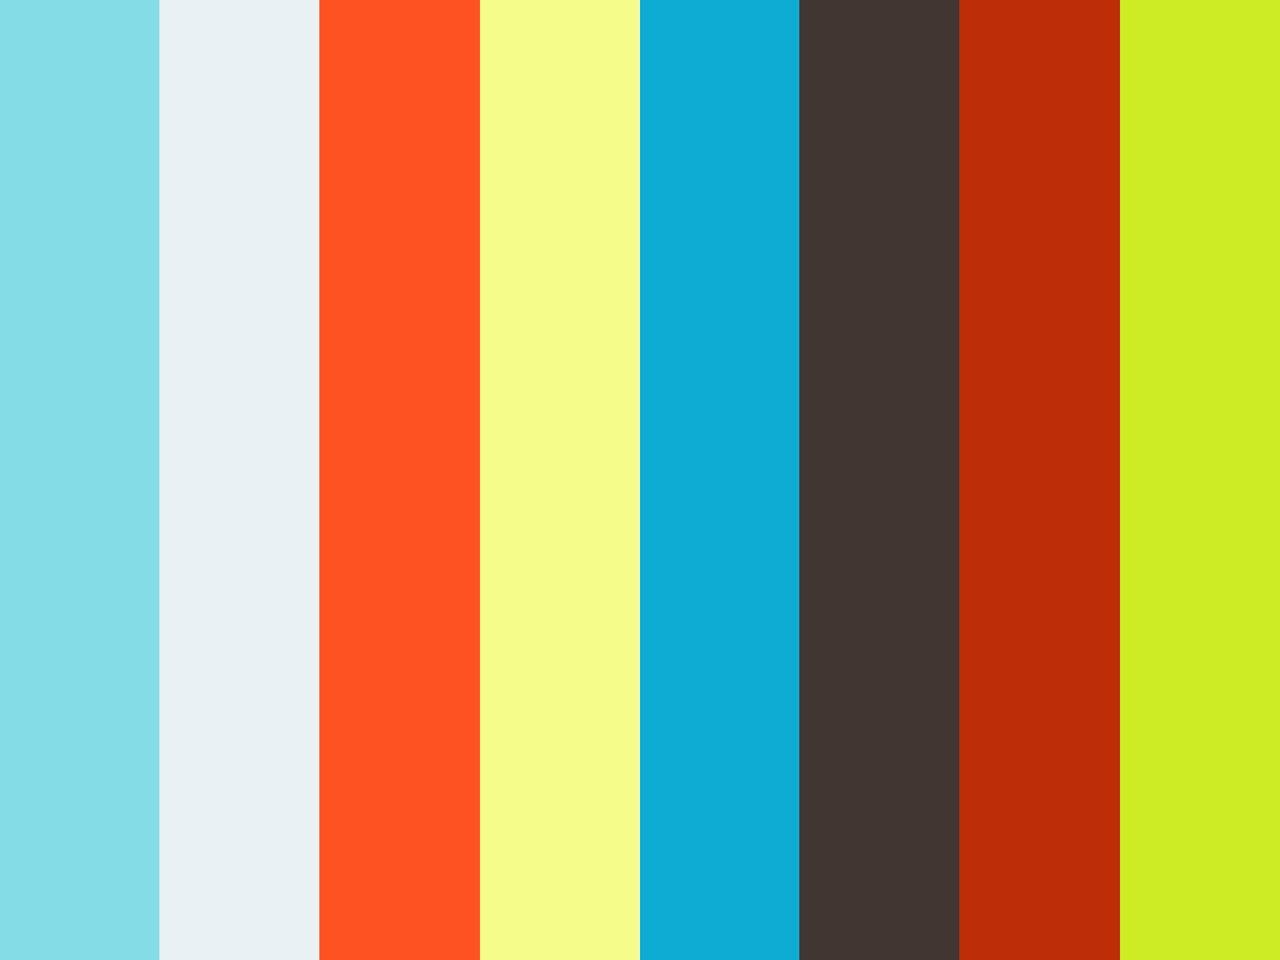 BURSTTT (128bpm loop)